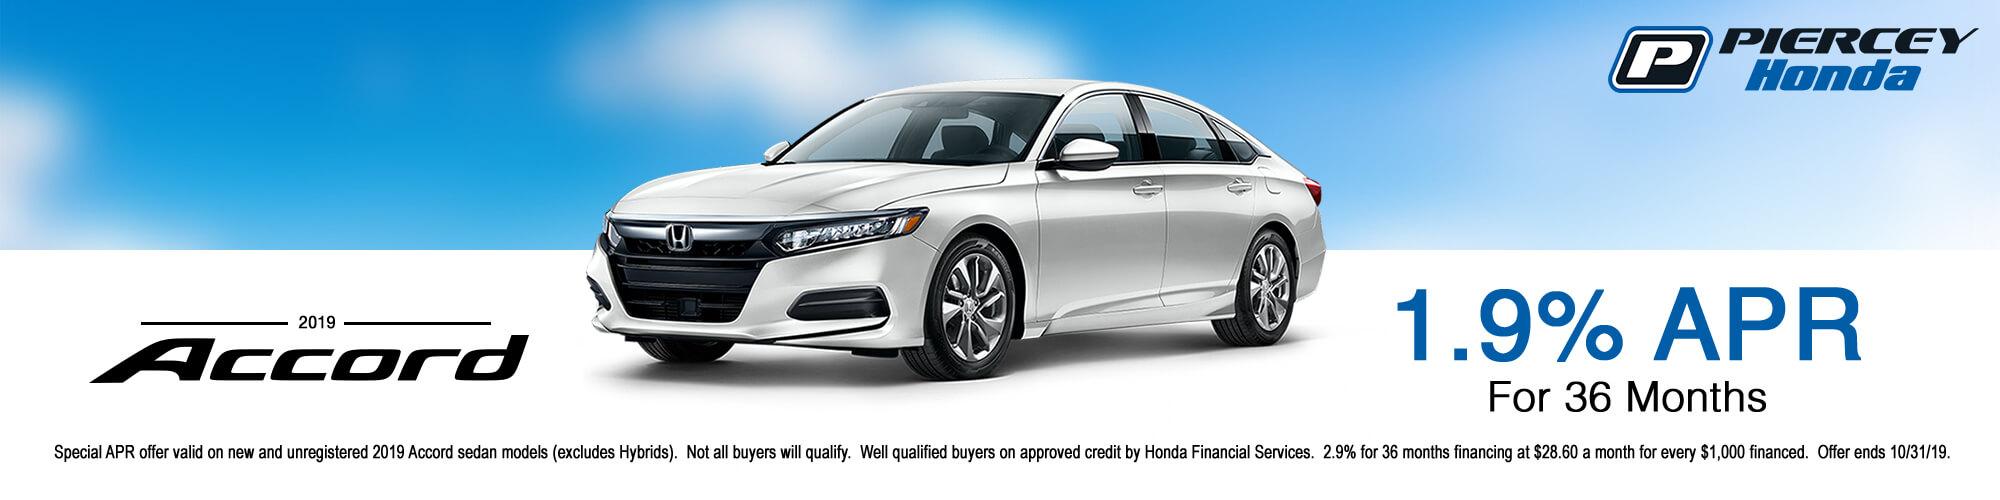 2019 Honda Accord APR Offer